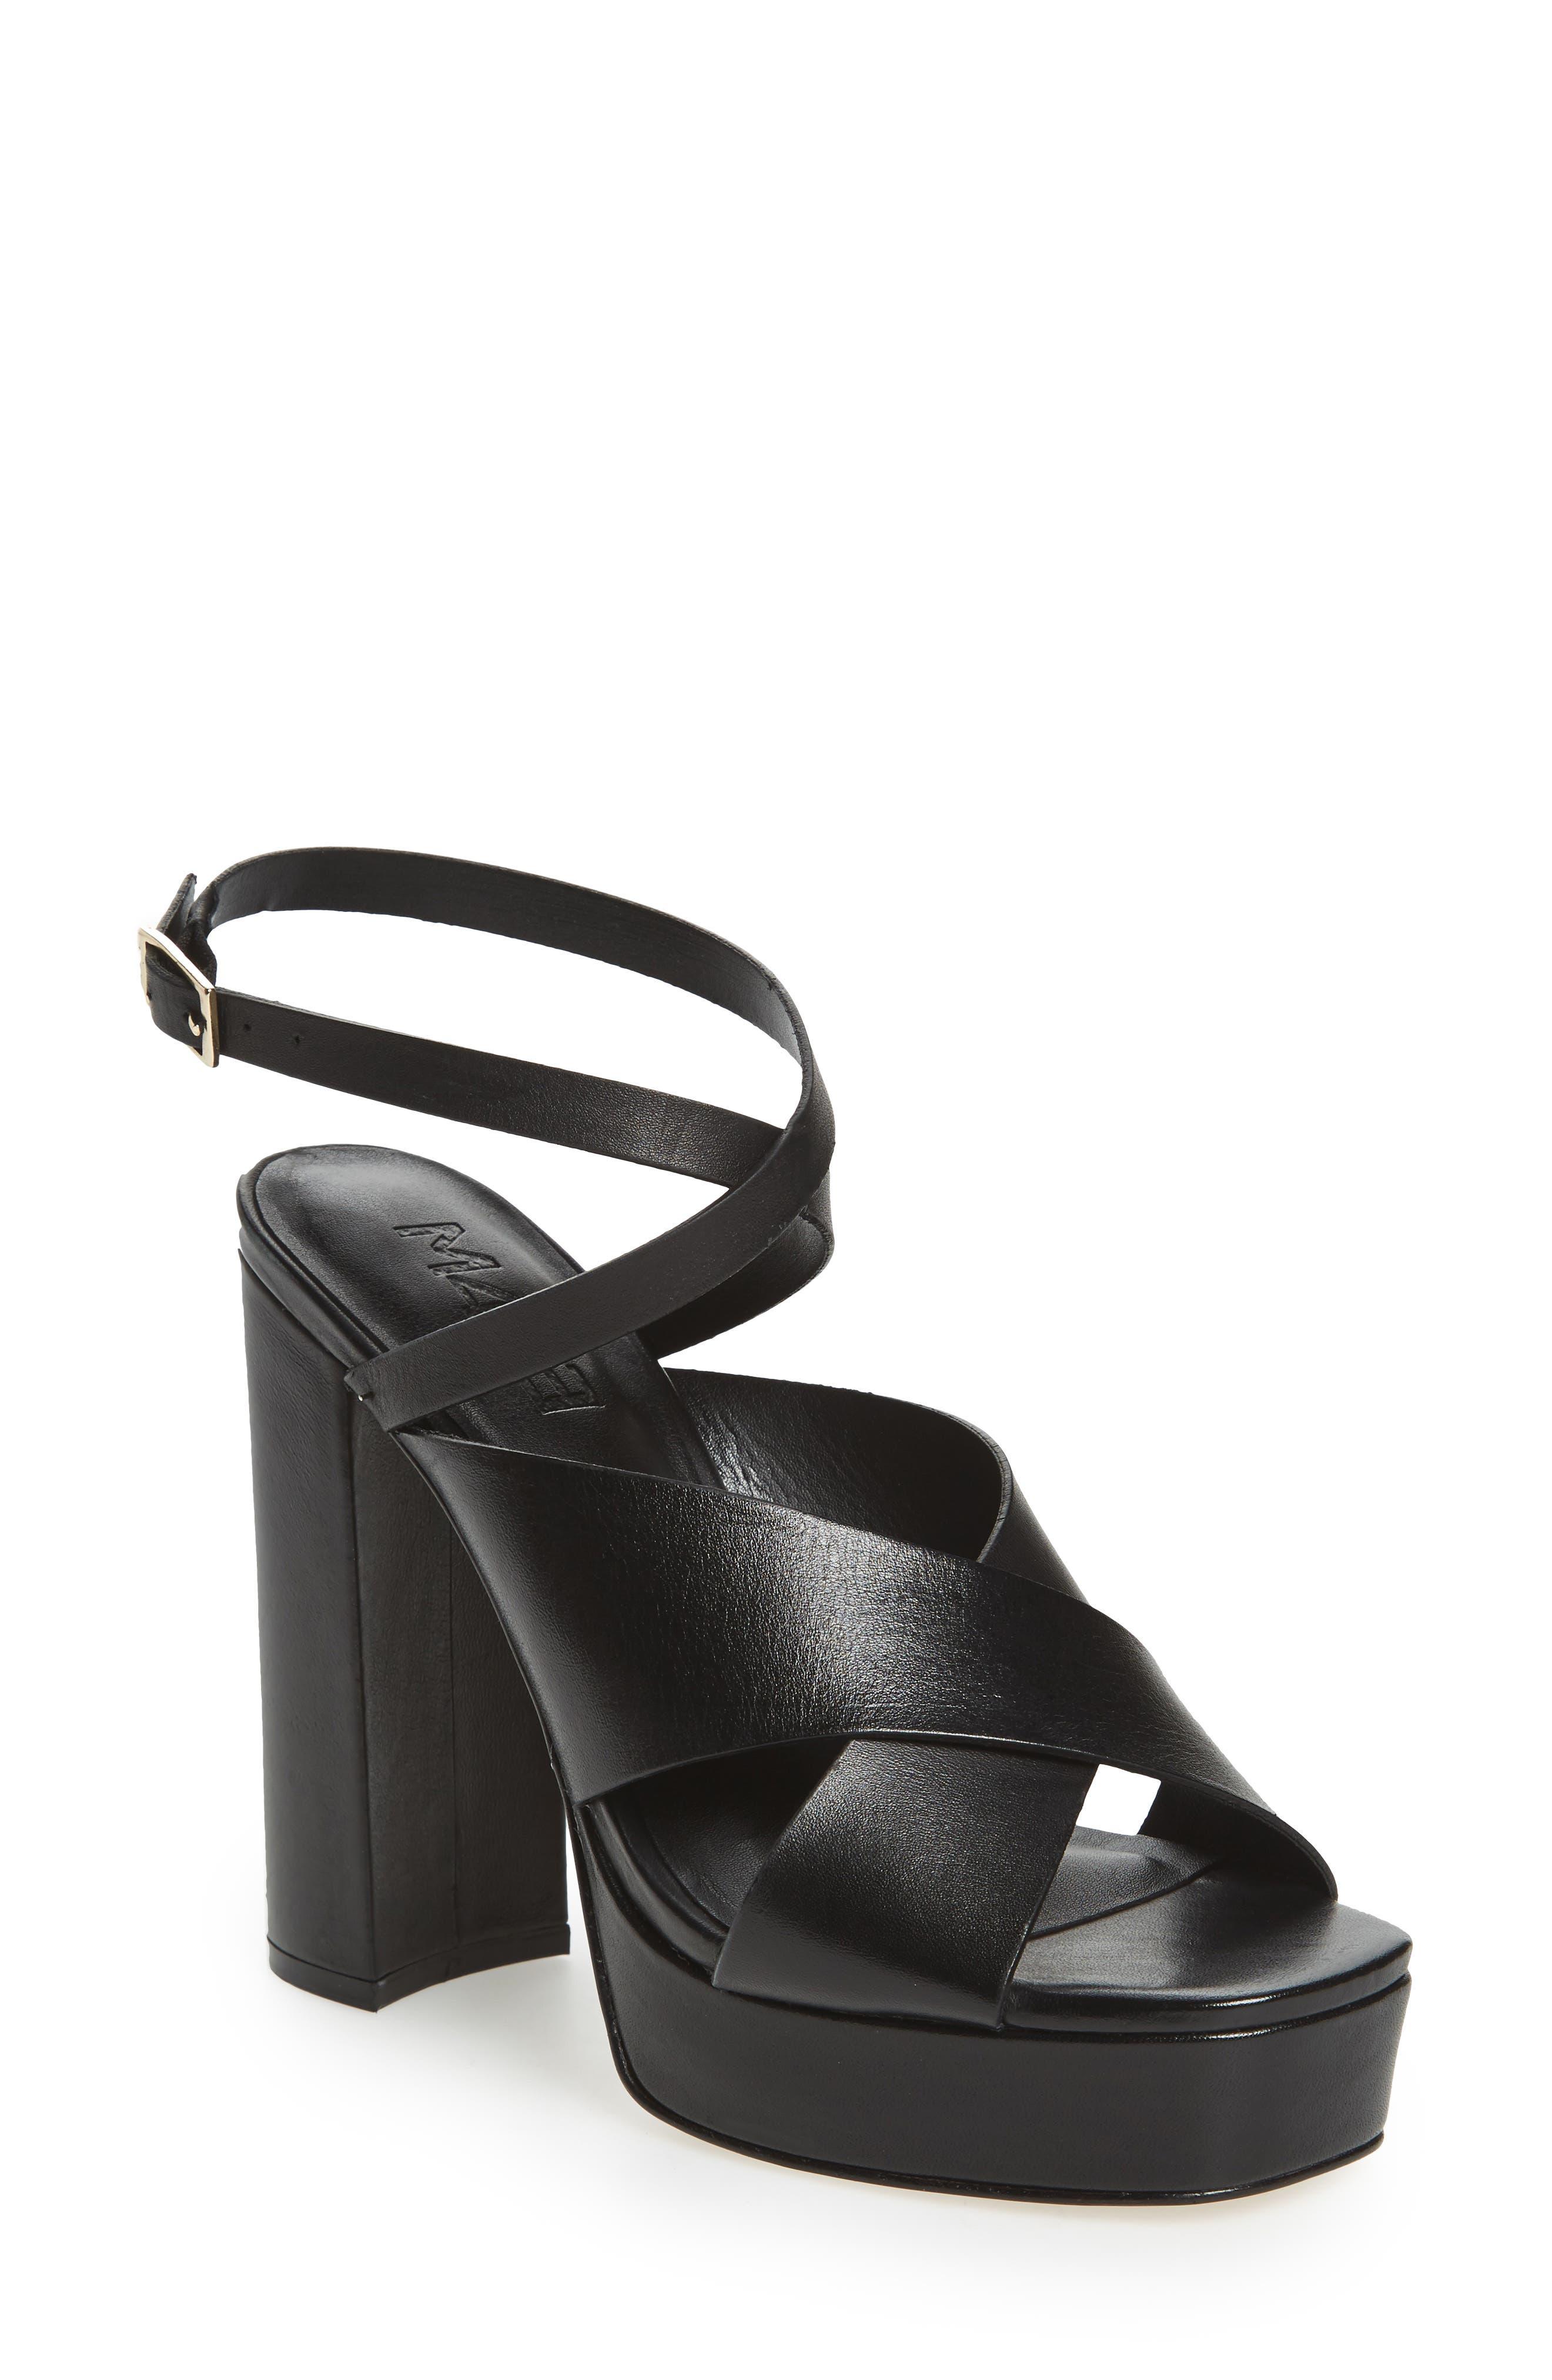 M4D3 Priscilla Wraparound Platform Sandal,                             Main thumbnail 1, color,                             BLACK